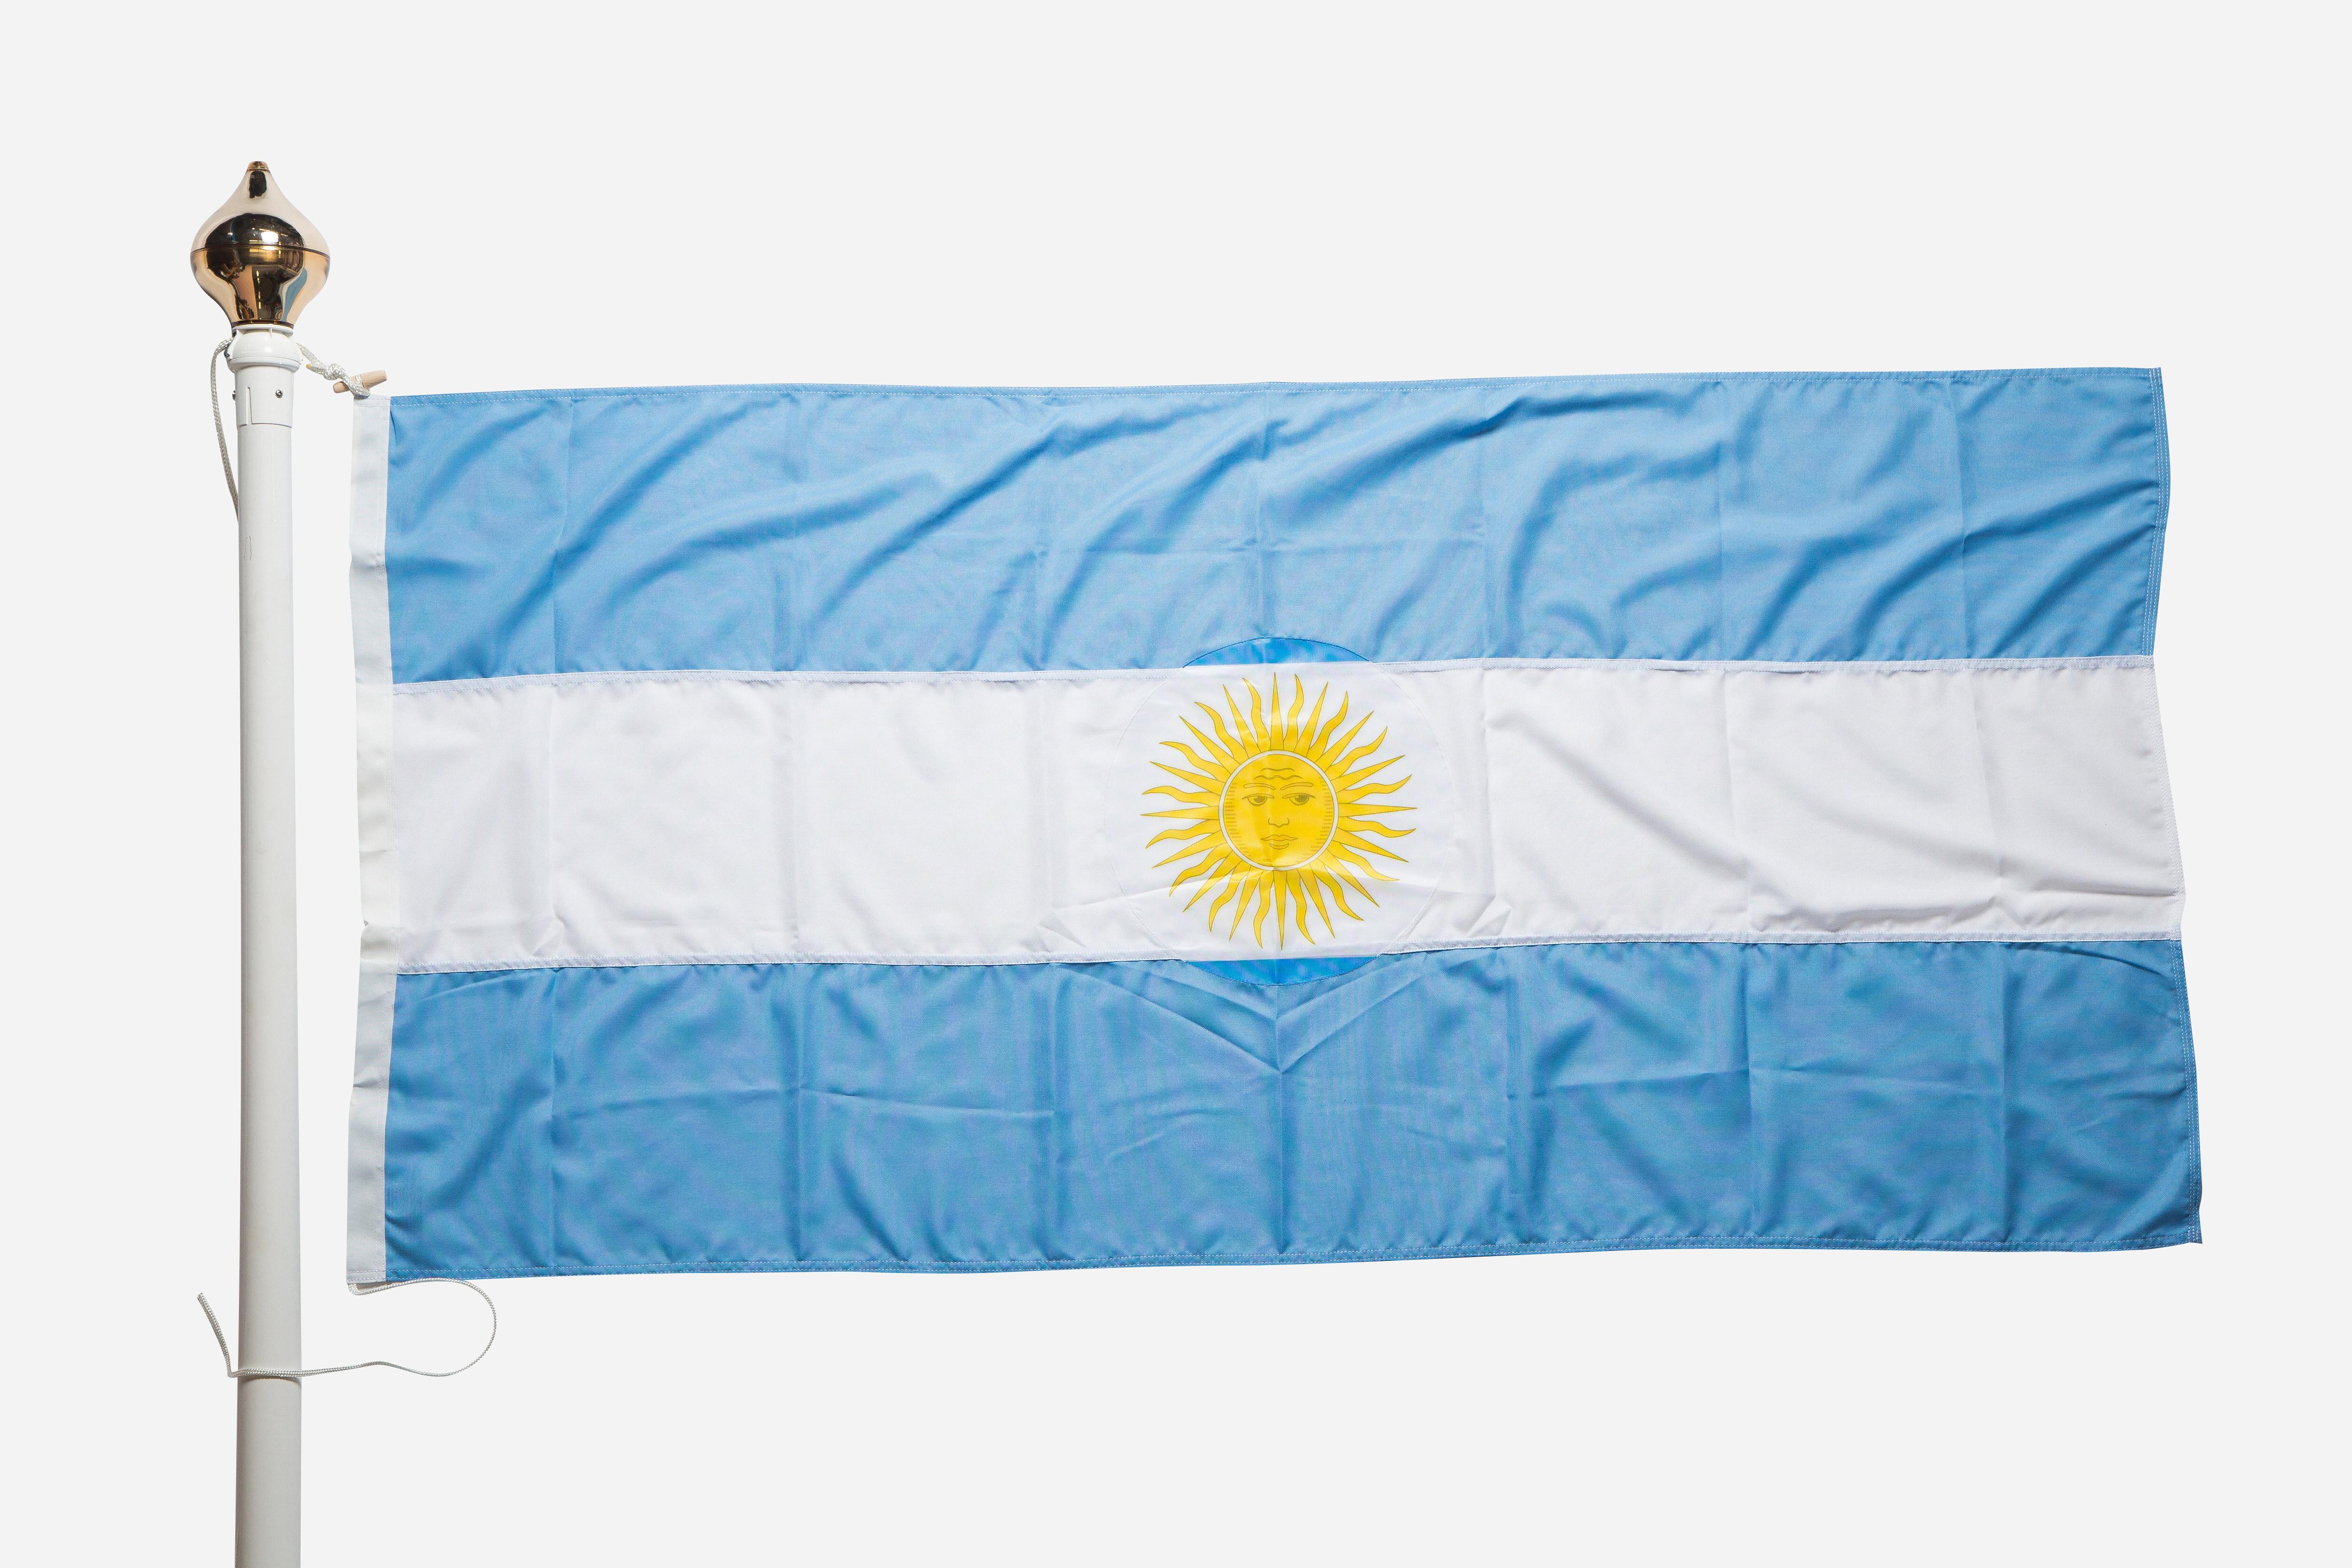 Argentina National Flag - Flagmakers Official Argentina Flag